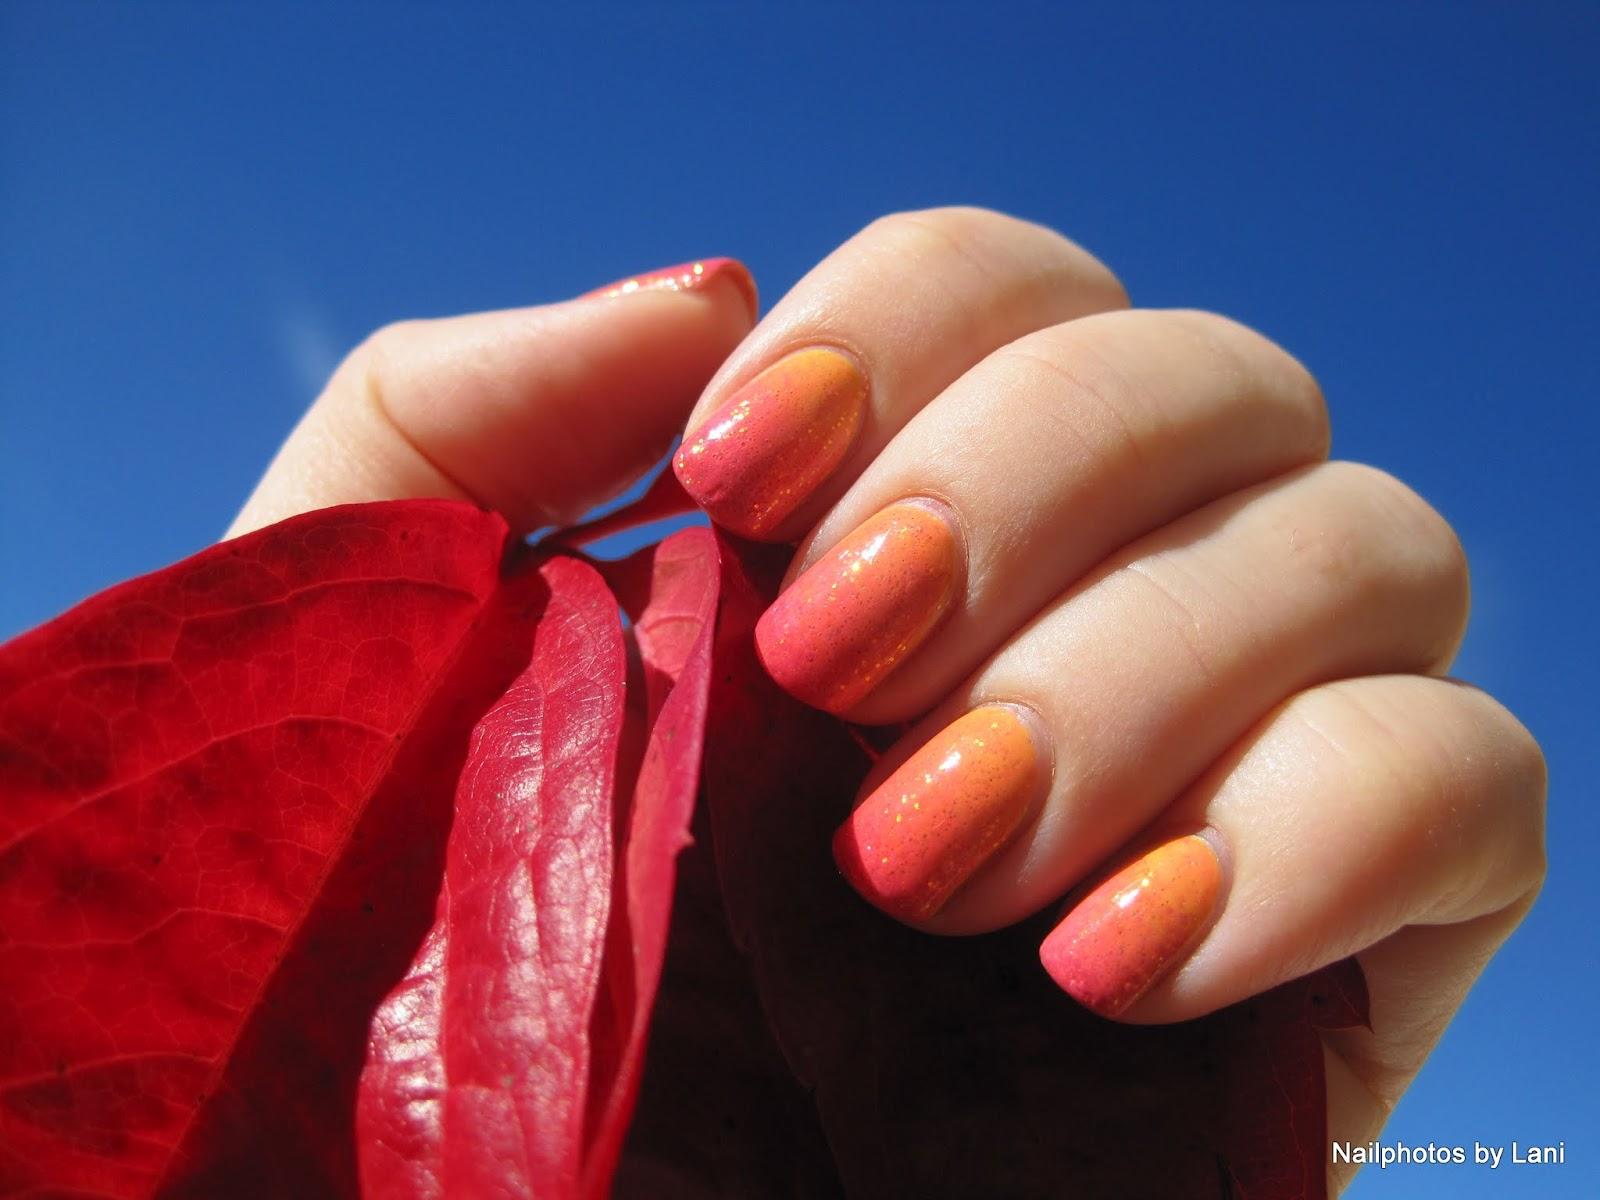 20 Cool Newspaper Nail Art Ideas - Hative | Newspaper nail